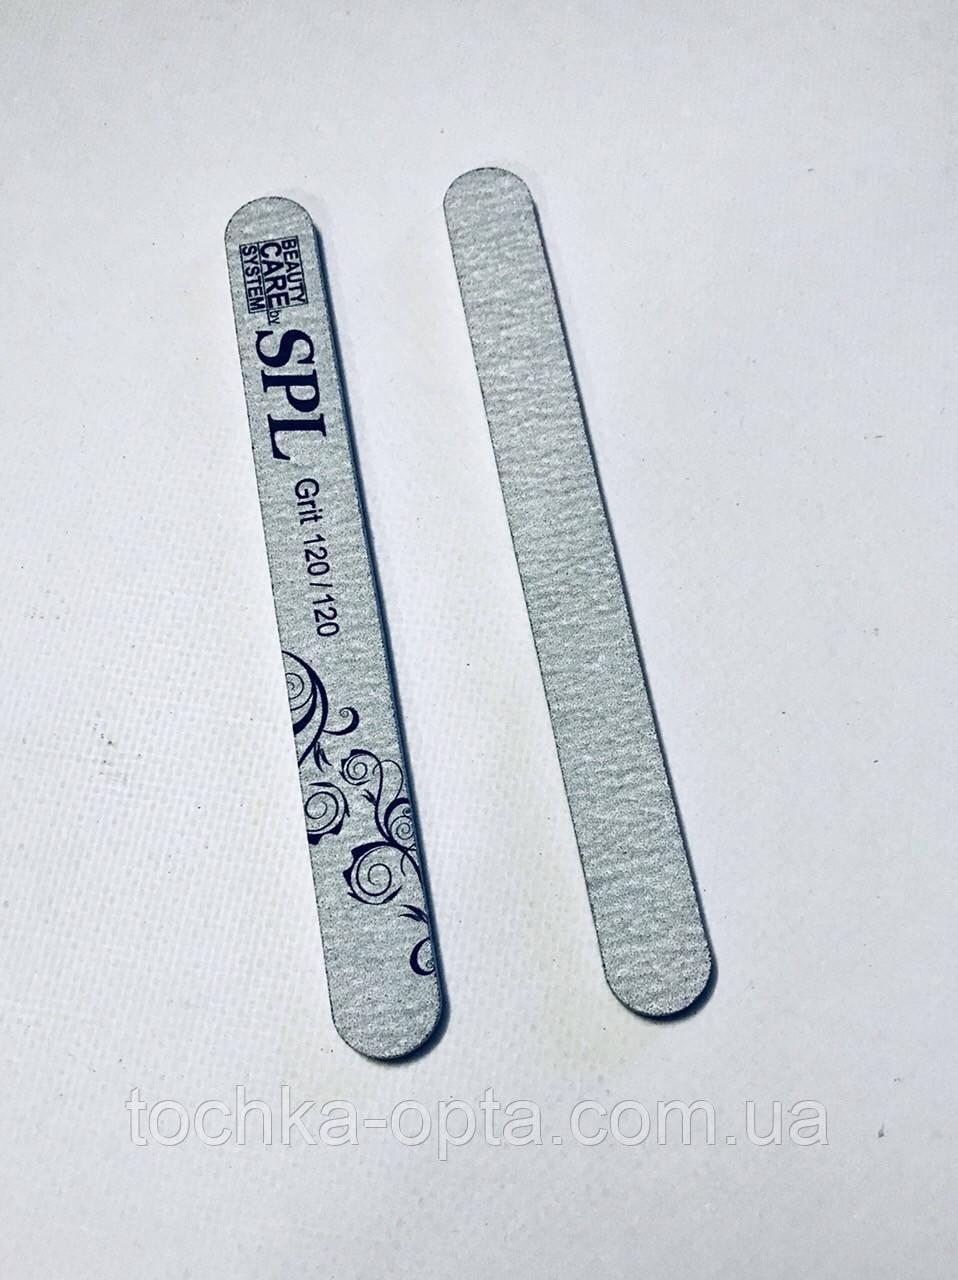 Пилка наждак SPL 120/120 серая узкая